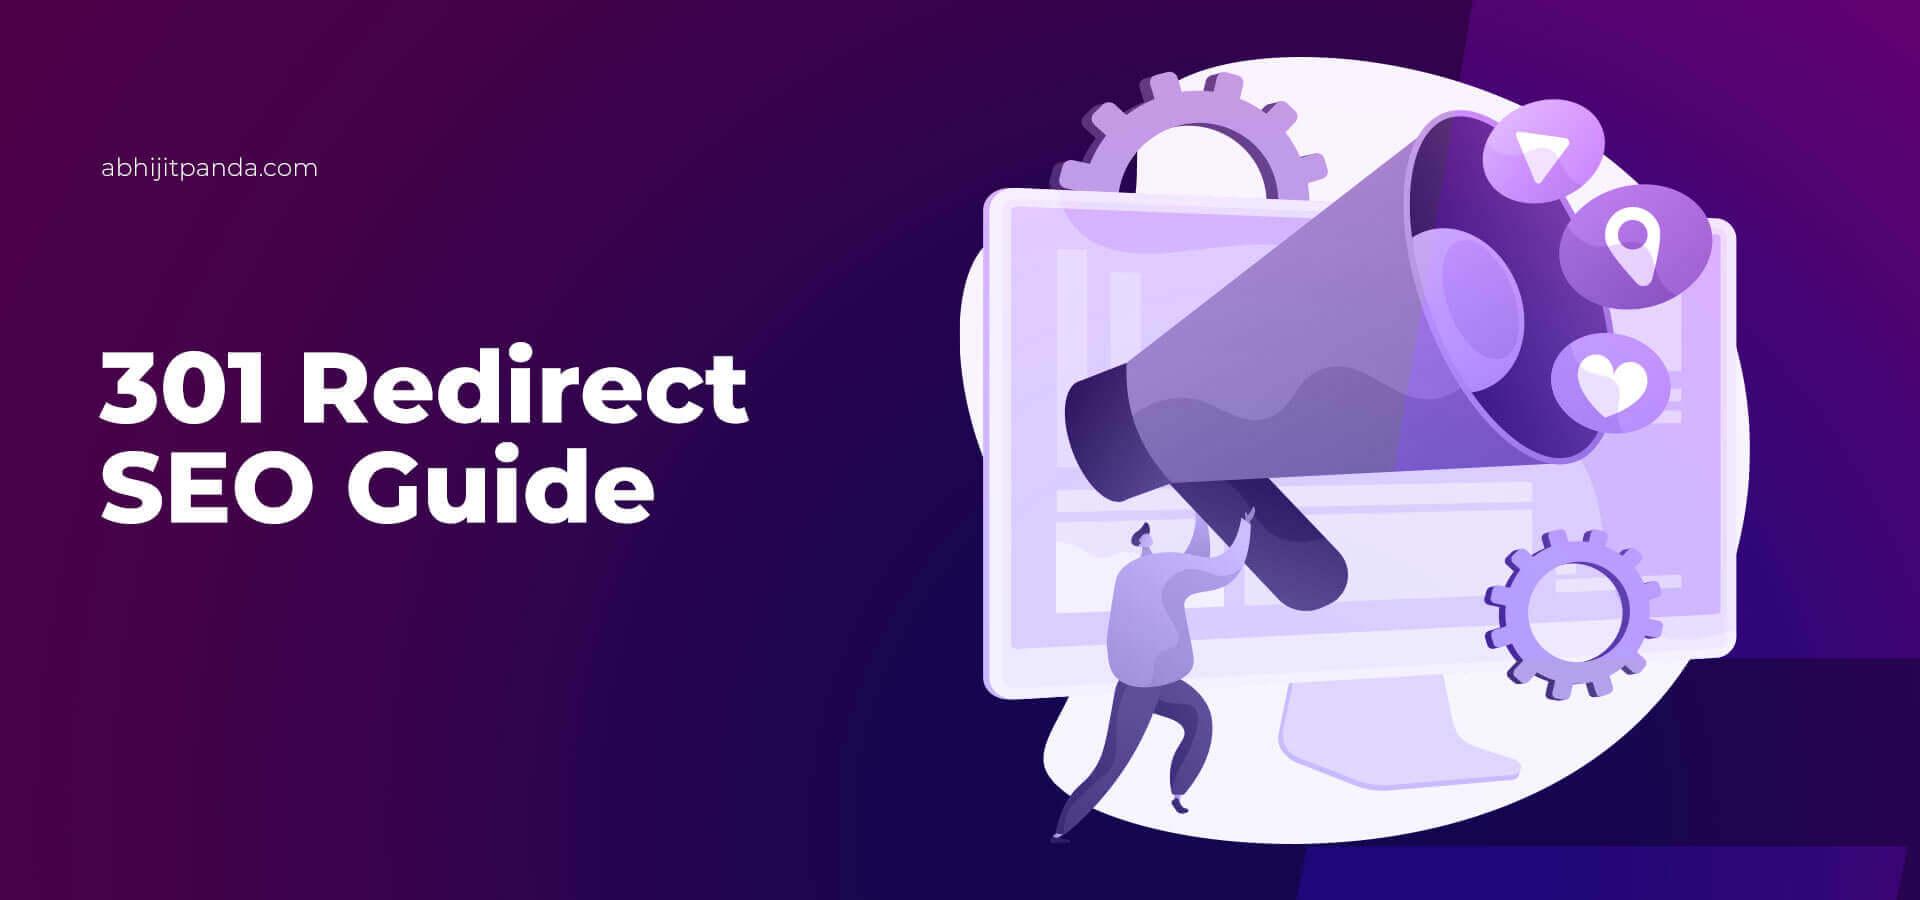 301 Redirect SEO Guide